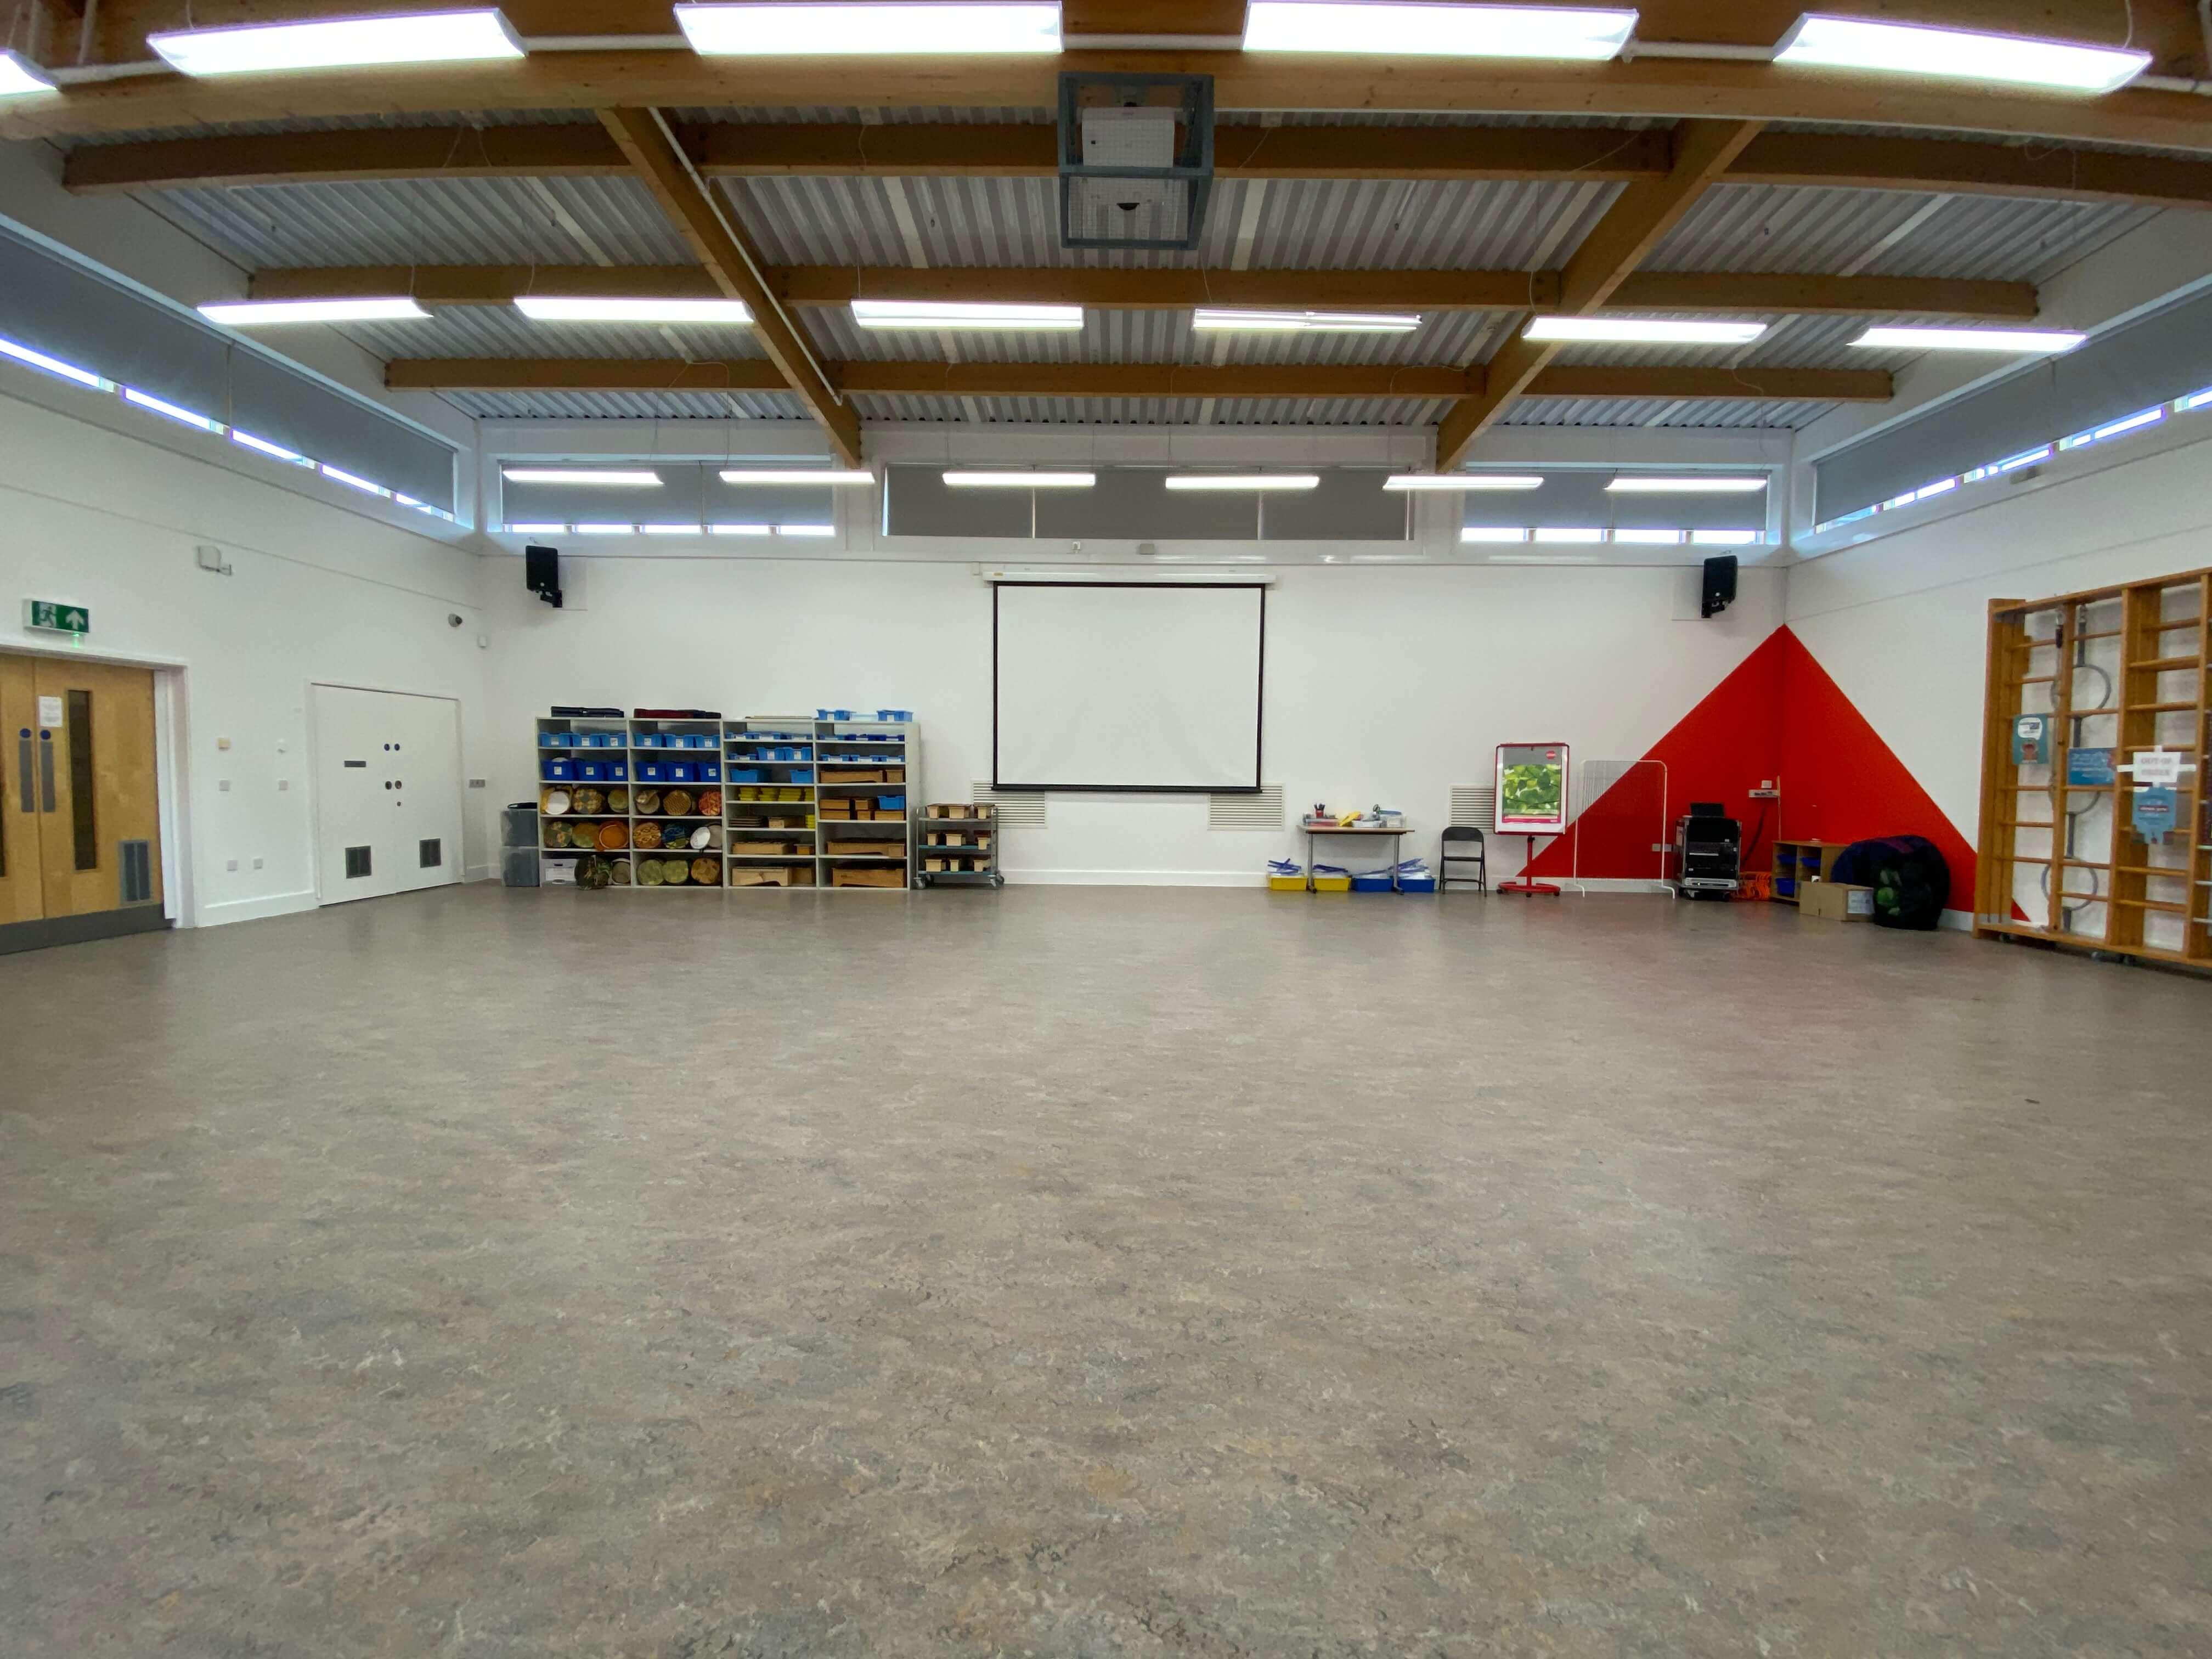 Fairway School Main School Hall